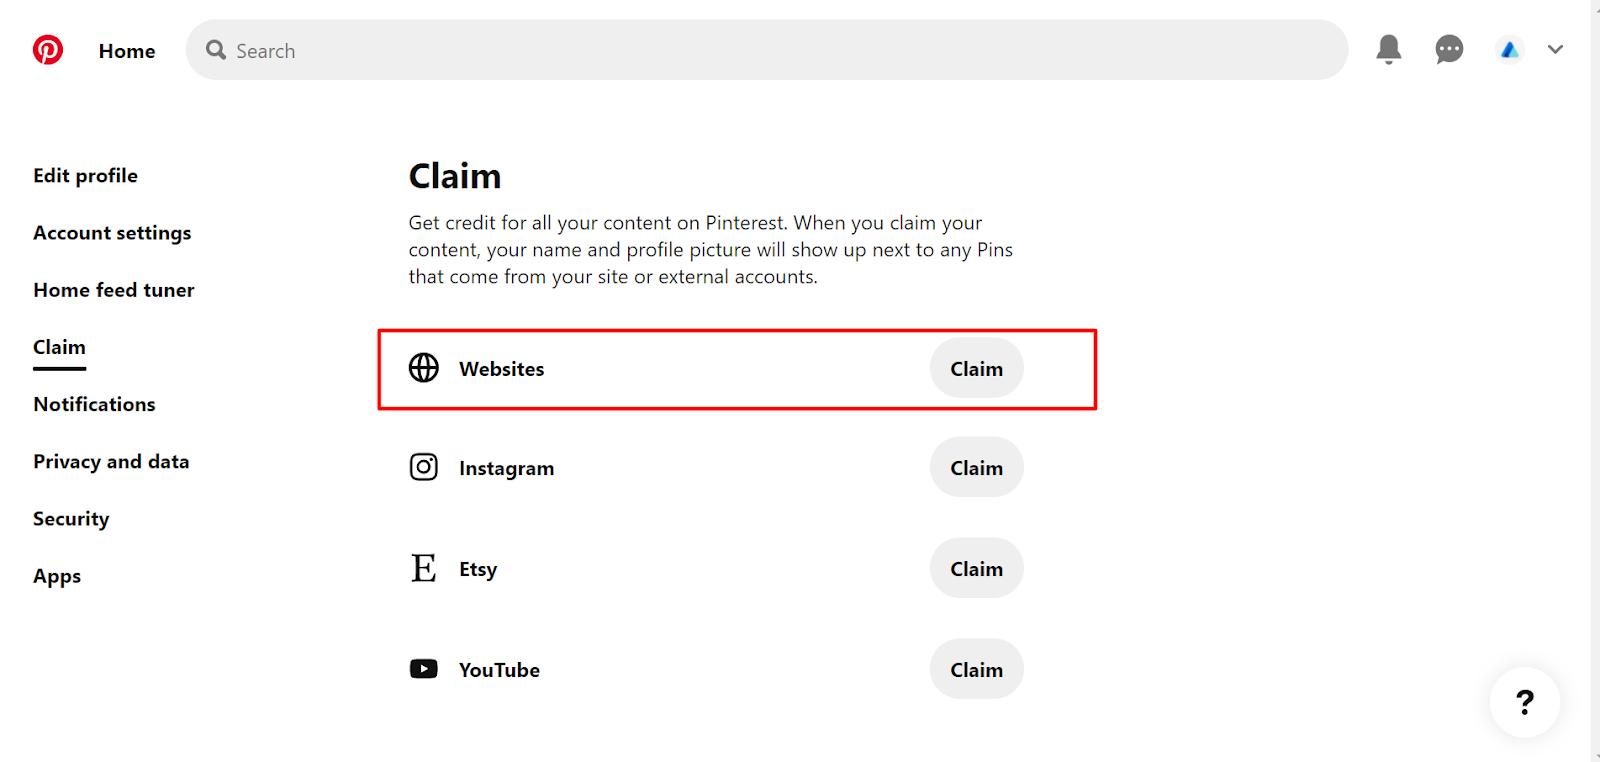 Claim Websites